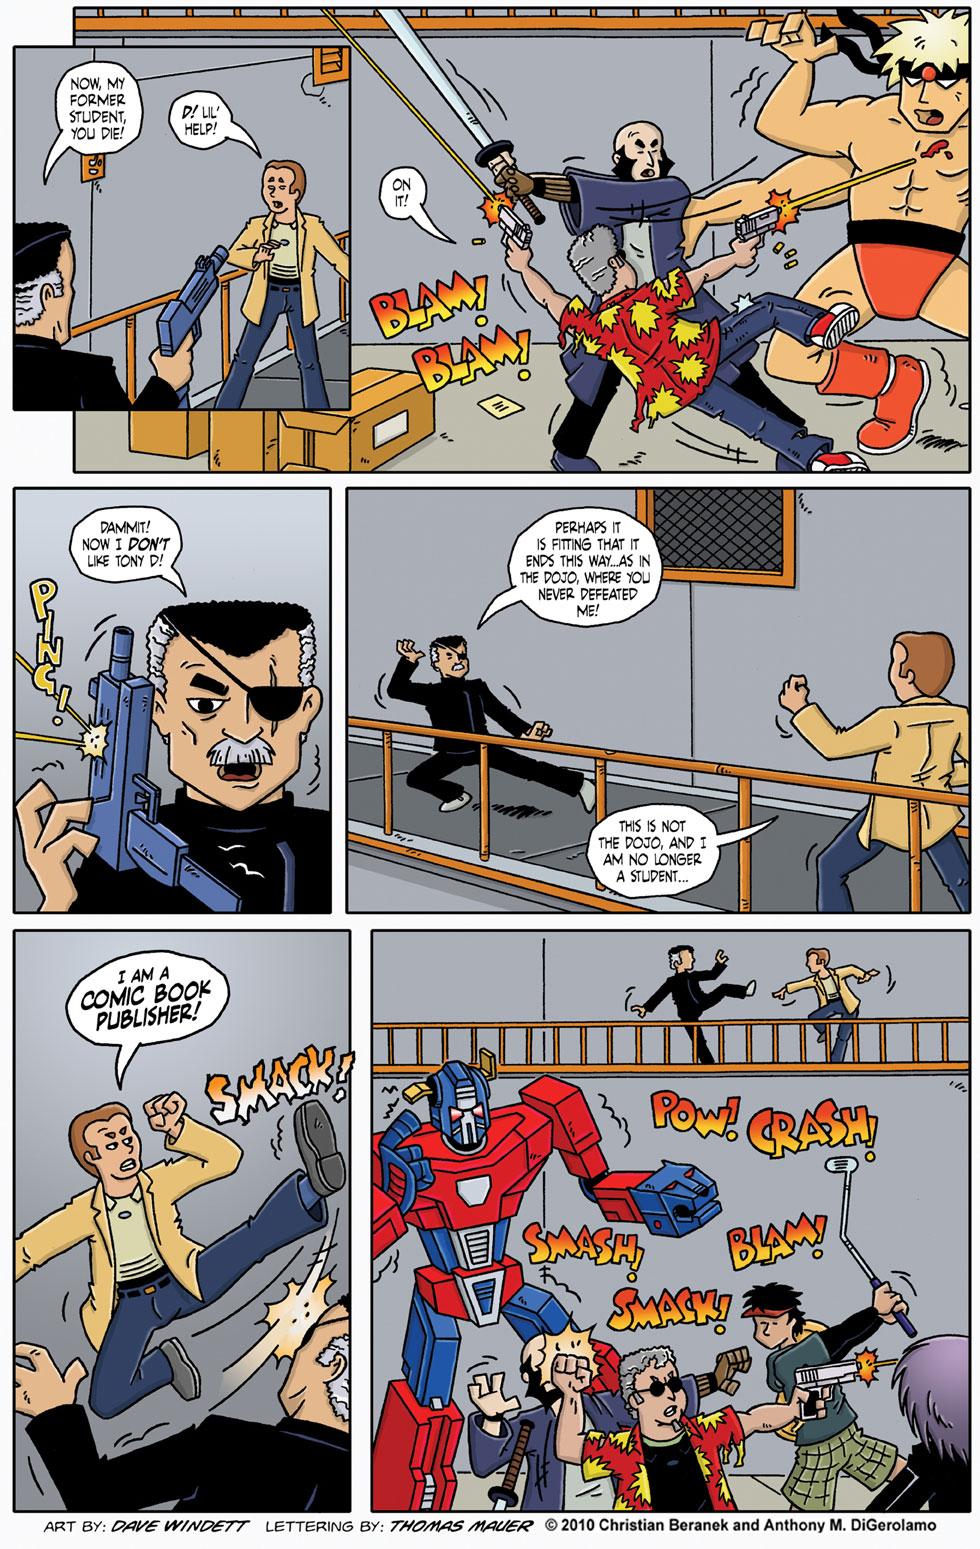 Comic Book Mafia #26: A Reason Not to Like Tony D